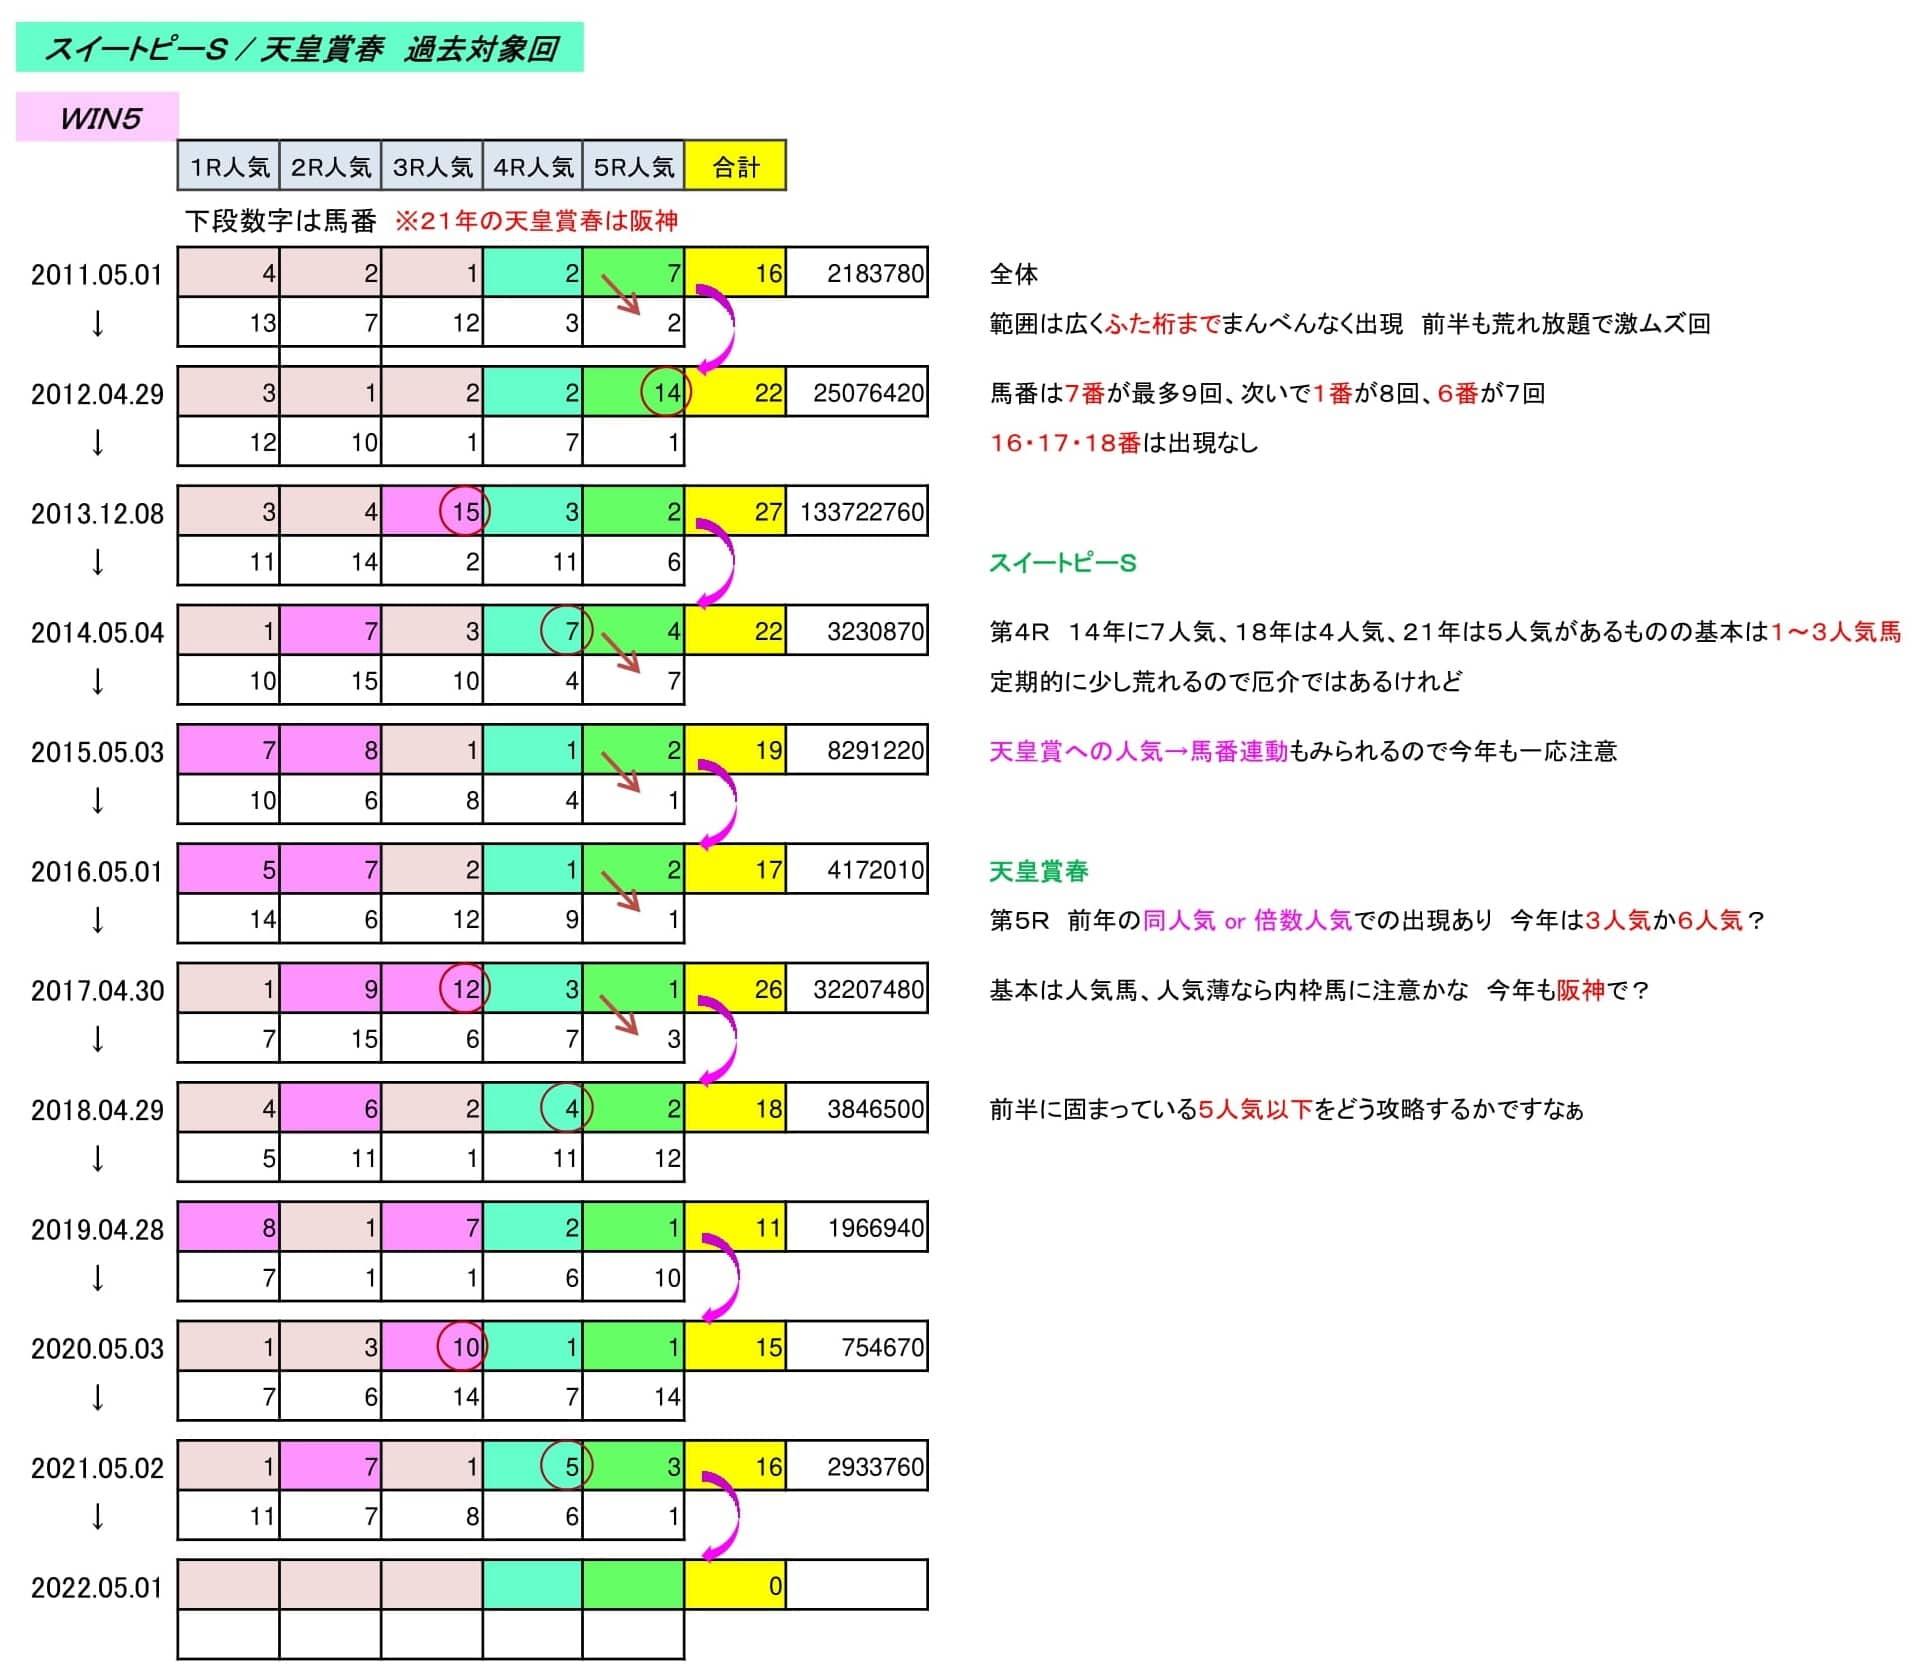 5_1_win5a.jpg